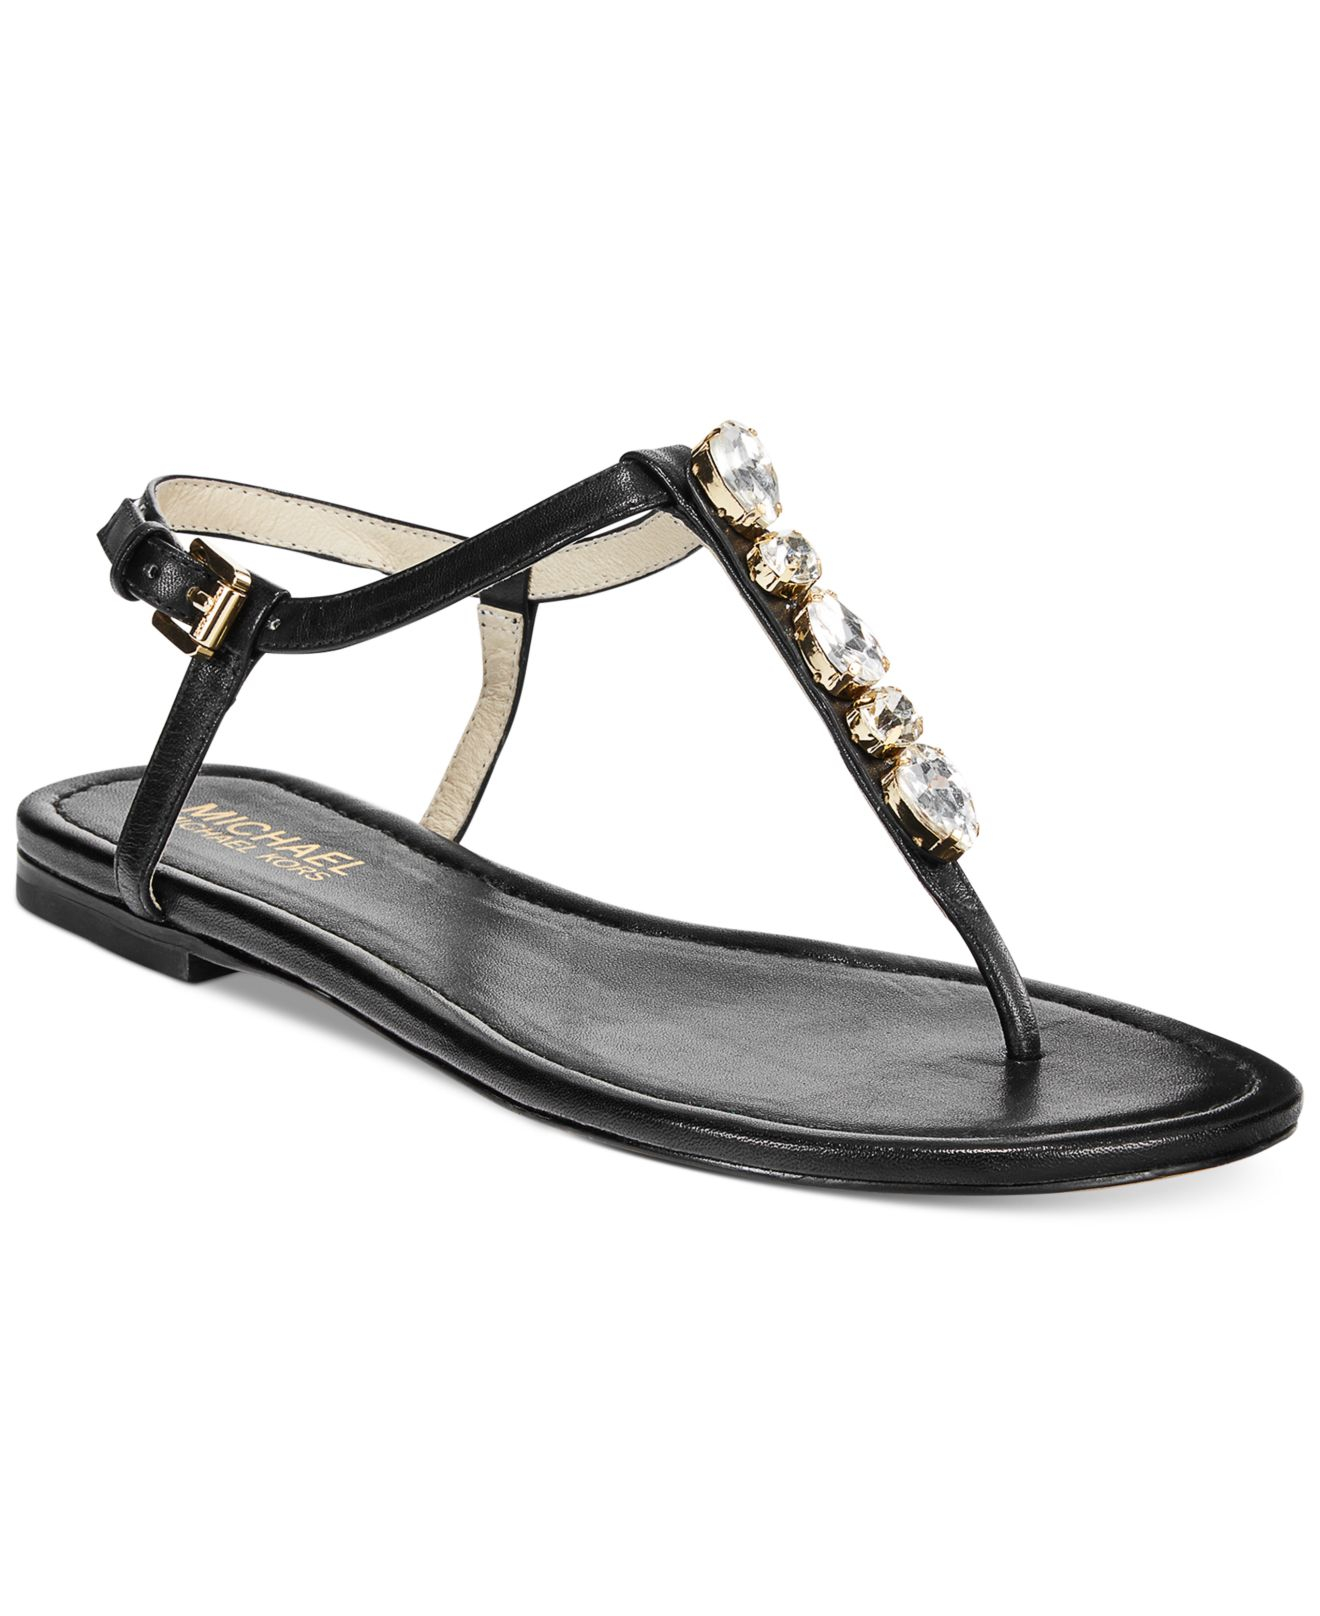 17c7804b1 Lyst - Michael Kors Michael Jayden Jeweled Flat Thong Sandals in Pink